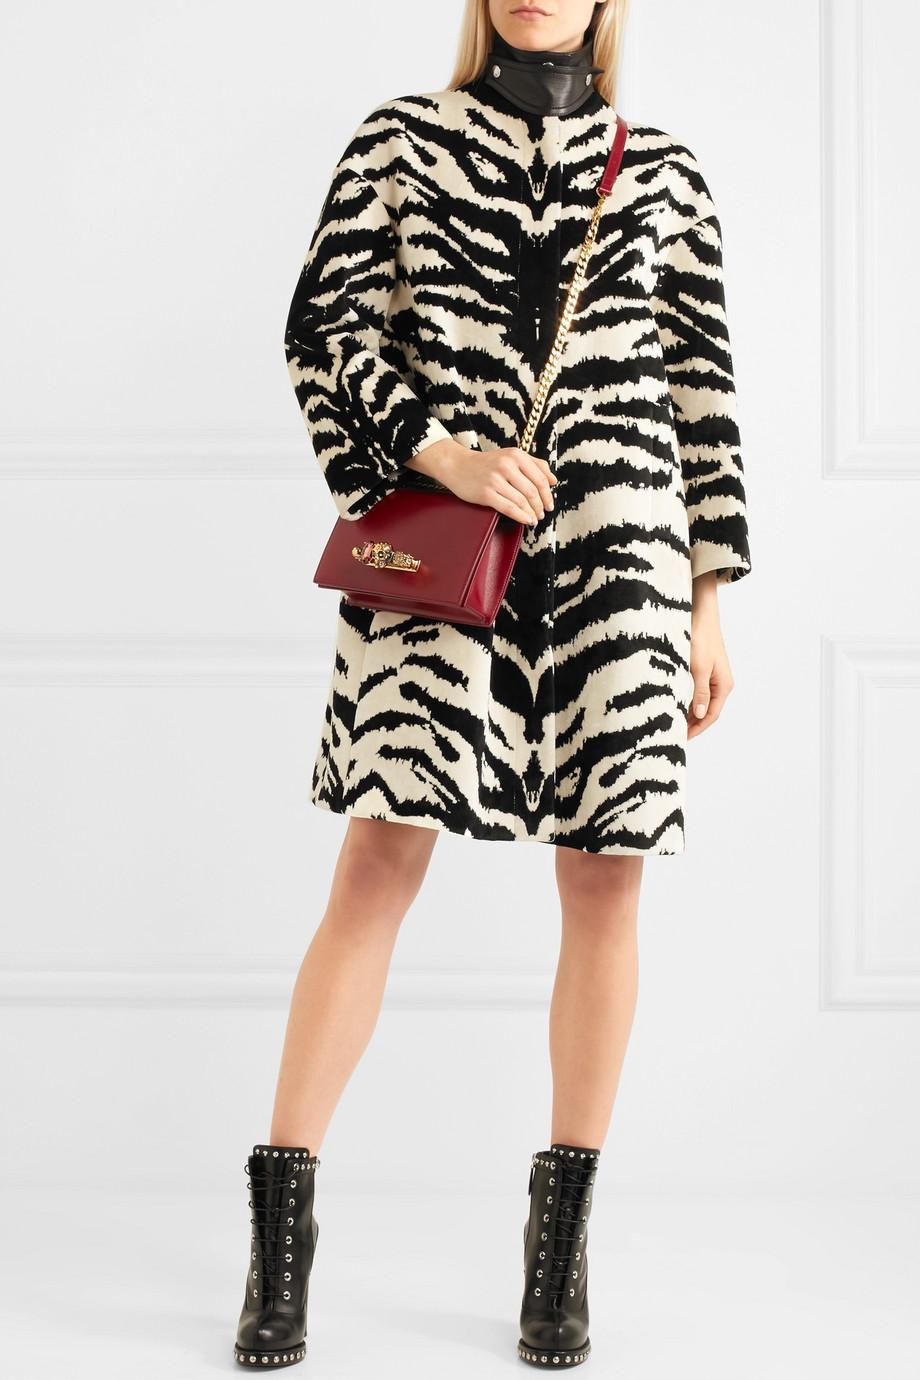 Alexander McQueen Leather-trimmed zebra-jacquard coat $3,695